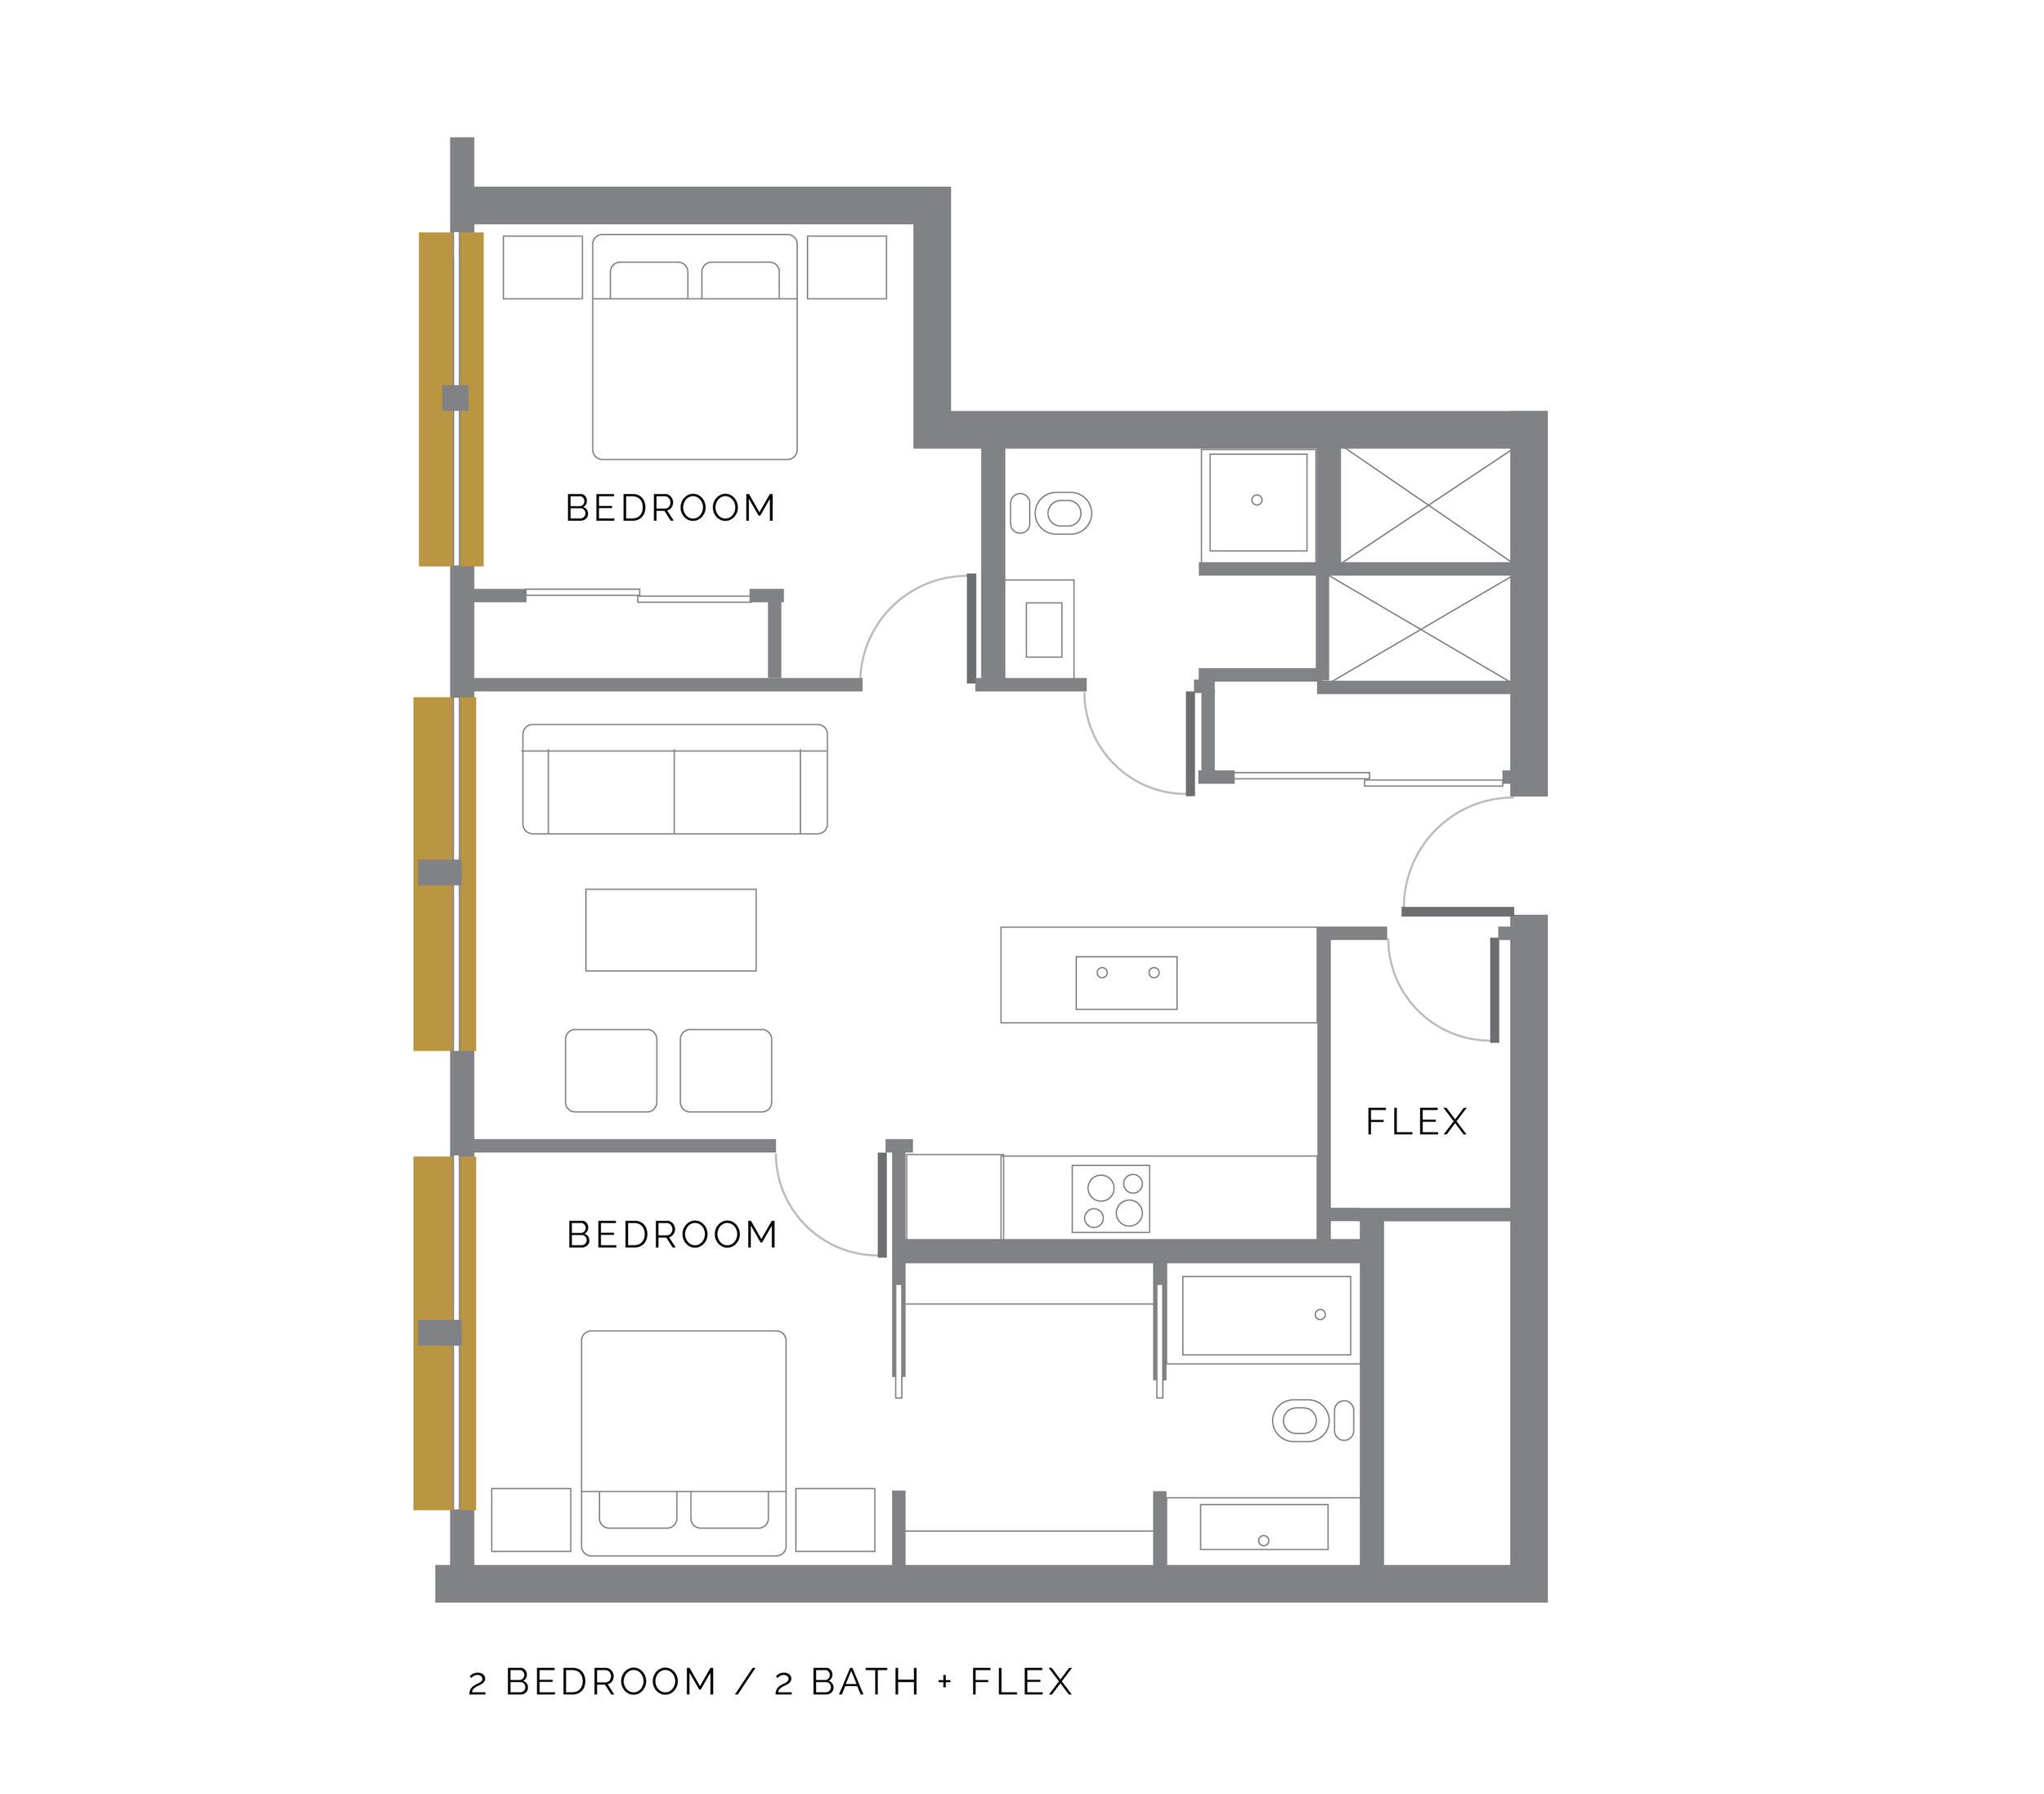 BRIXTONFLATSunitplans-02.jpg